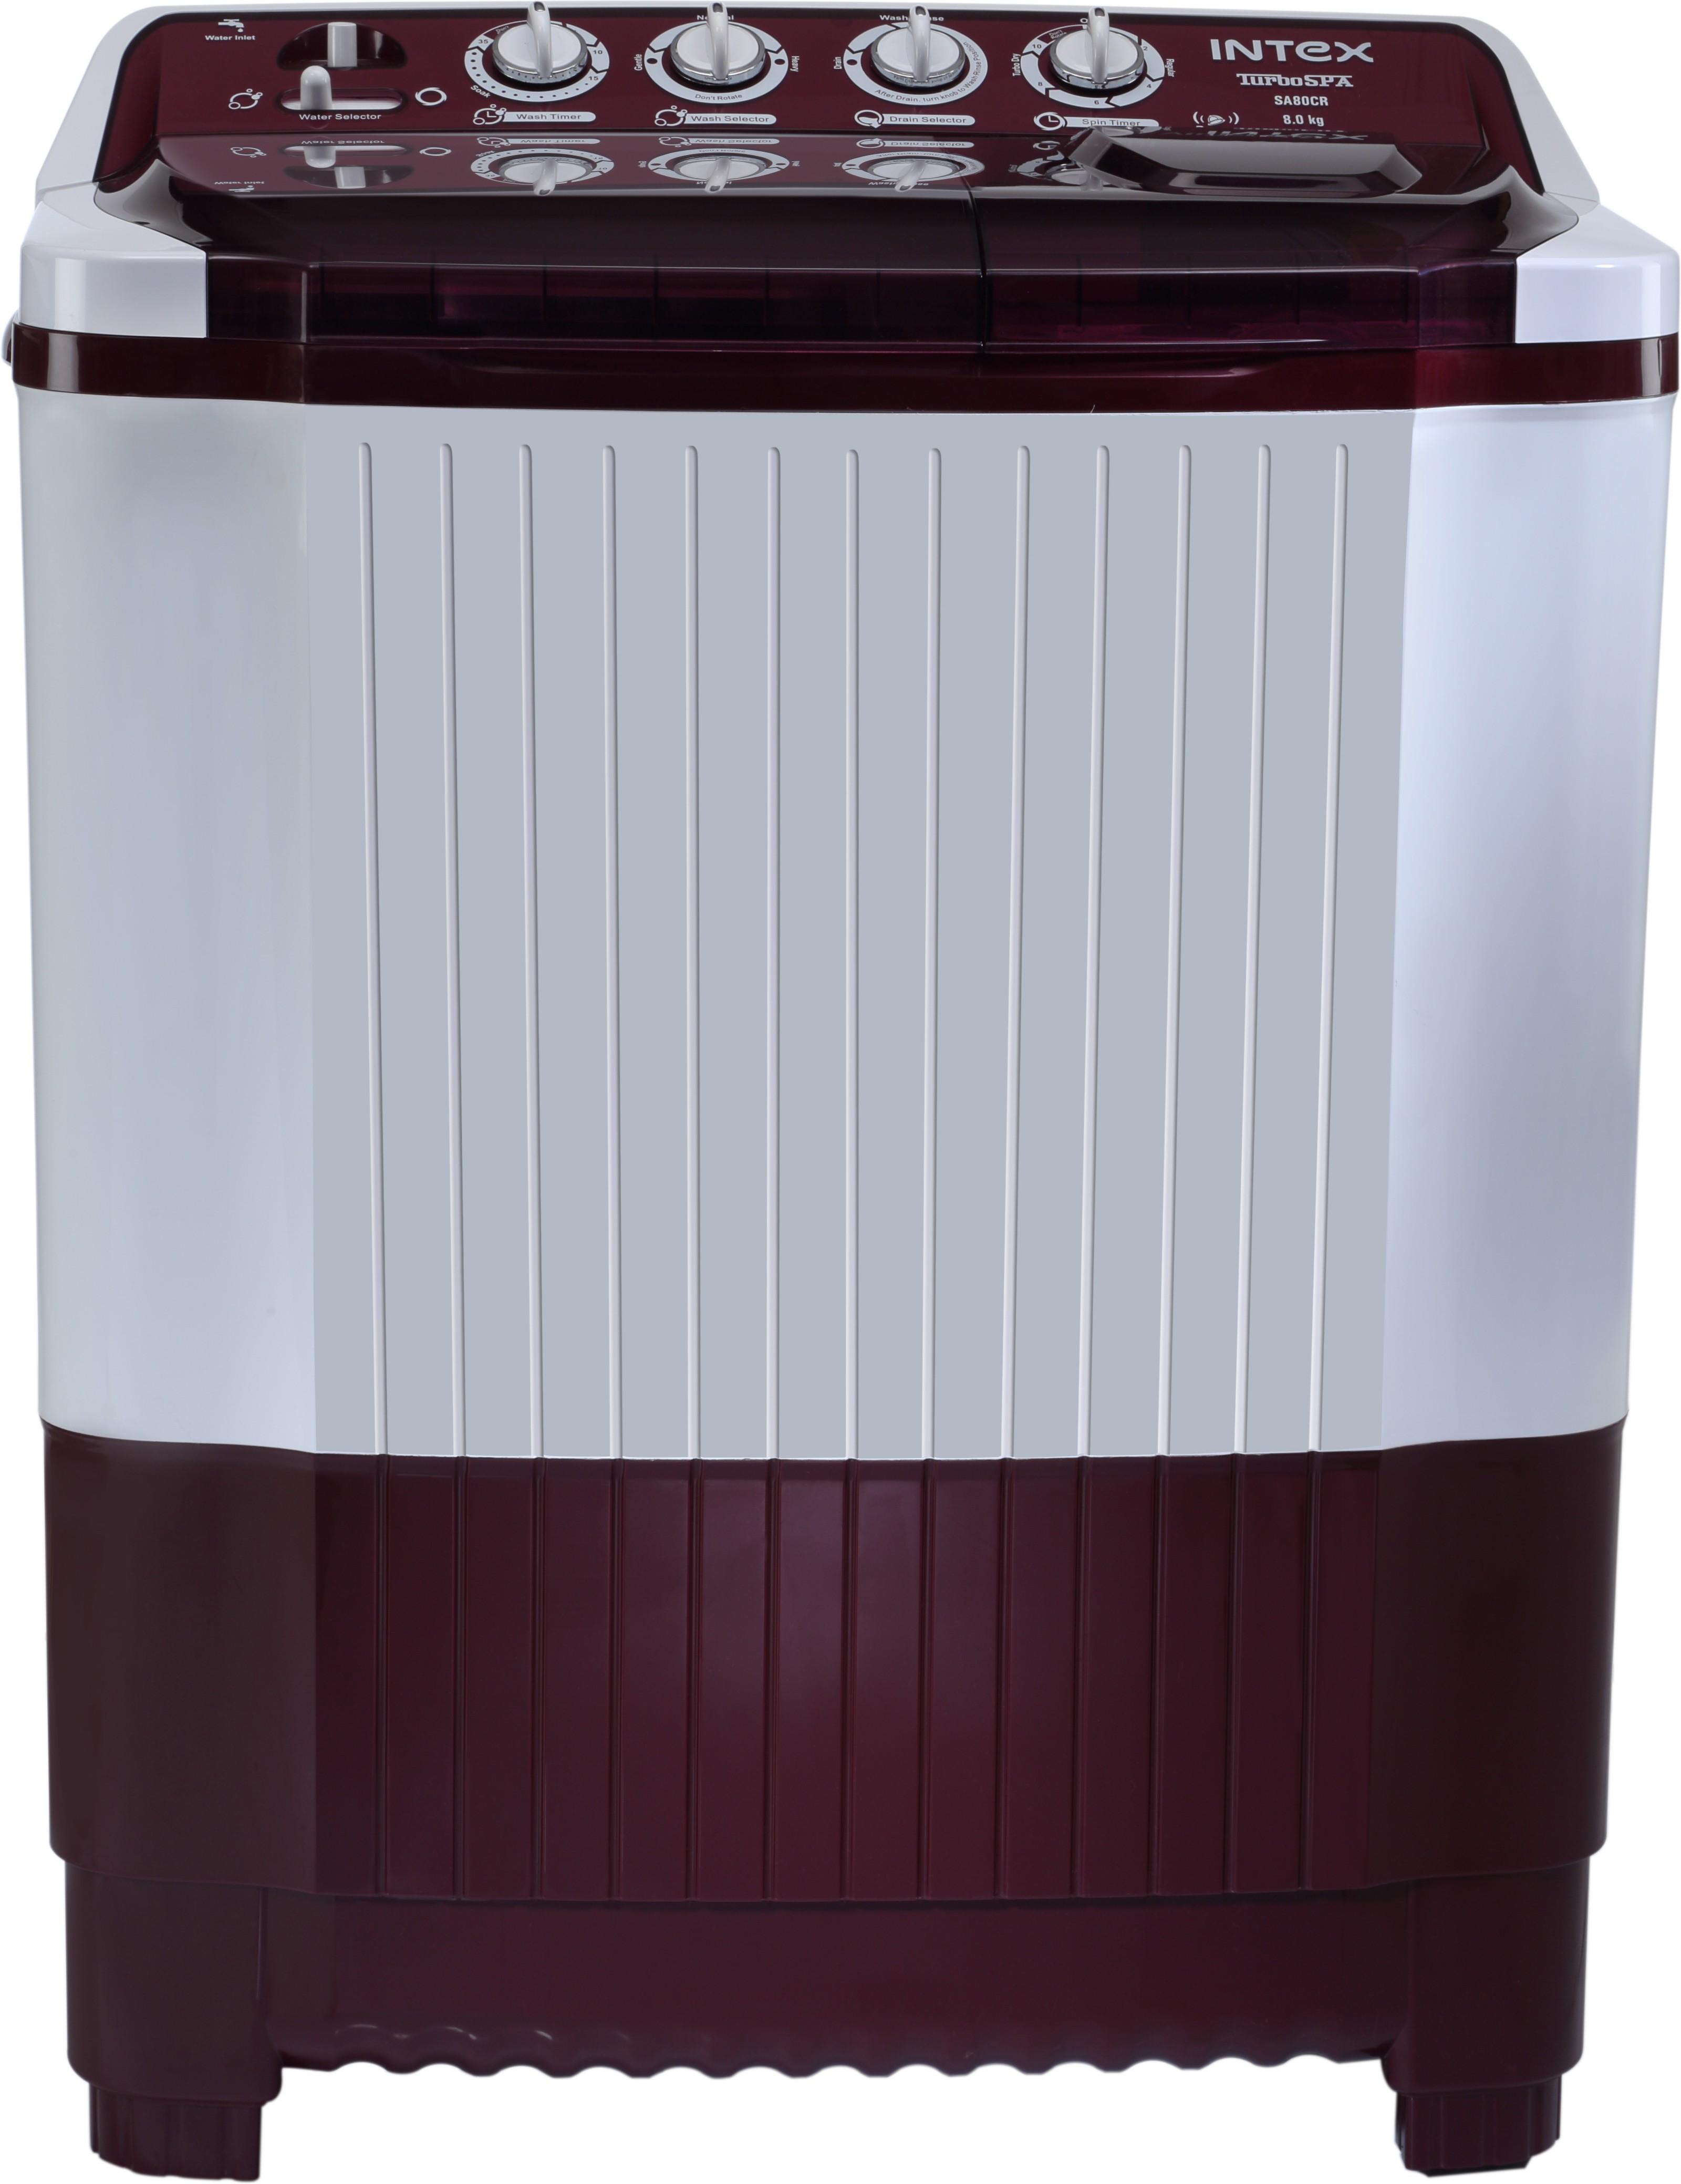 INTEX WM SA80 CR 8KG Semi Automatic Top Load Washing Machine